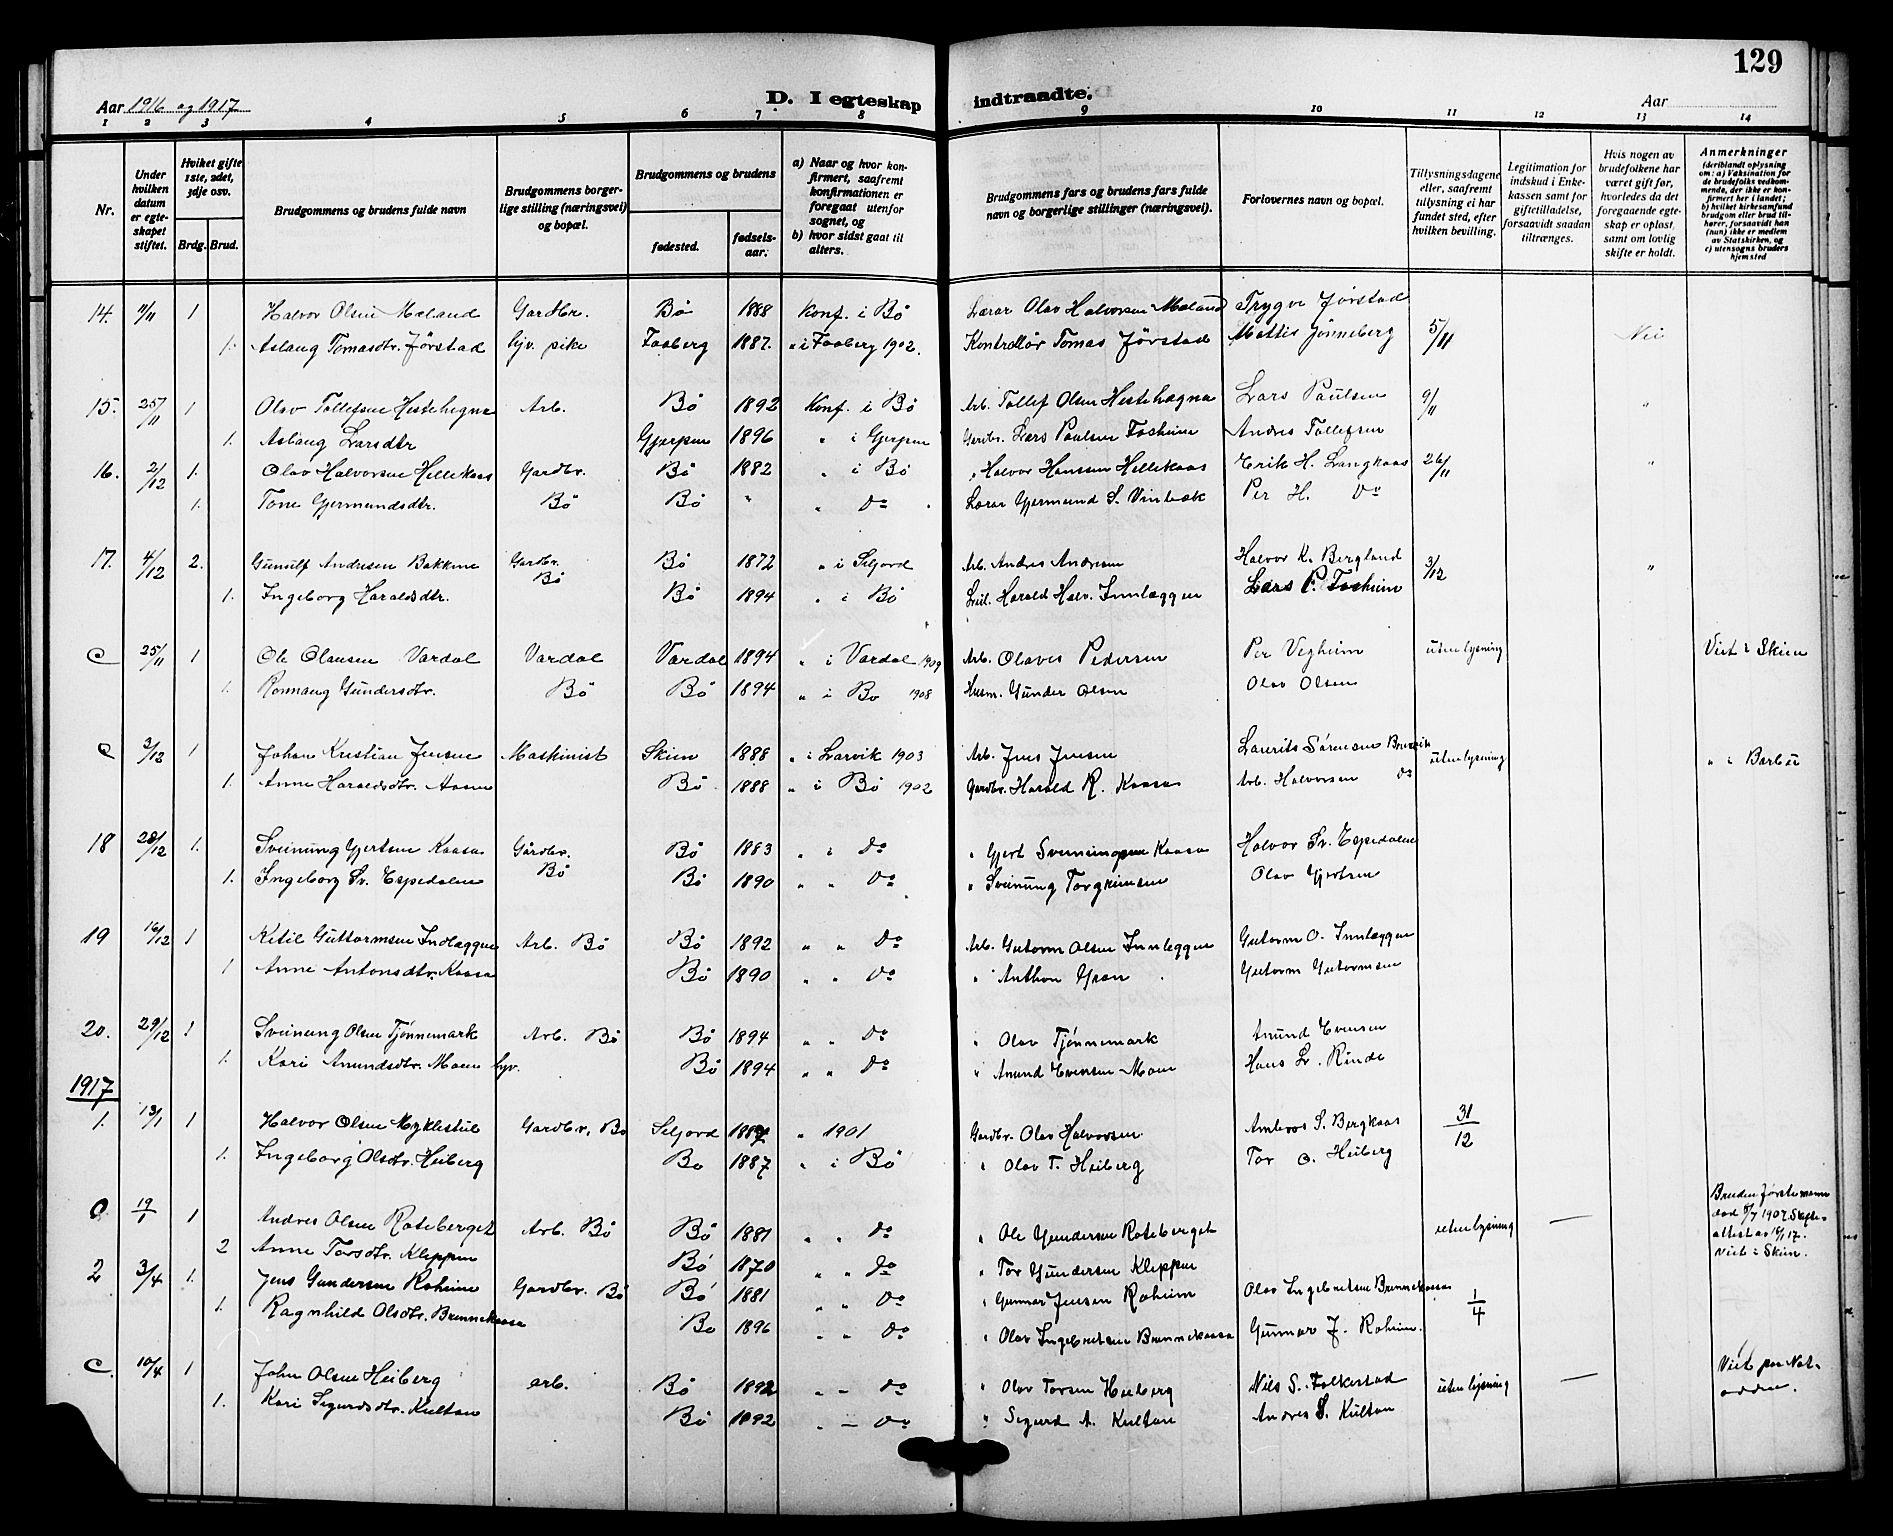 SAKO, Bø kirkebøker, G/Ga/L0007: Klokkerbok nr. 7, 1909-1924, s. 129